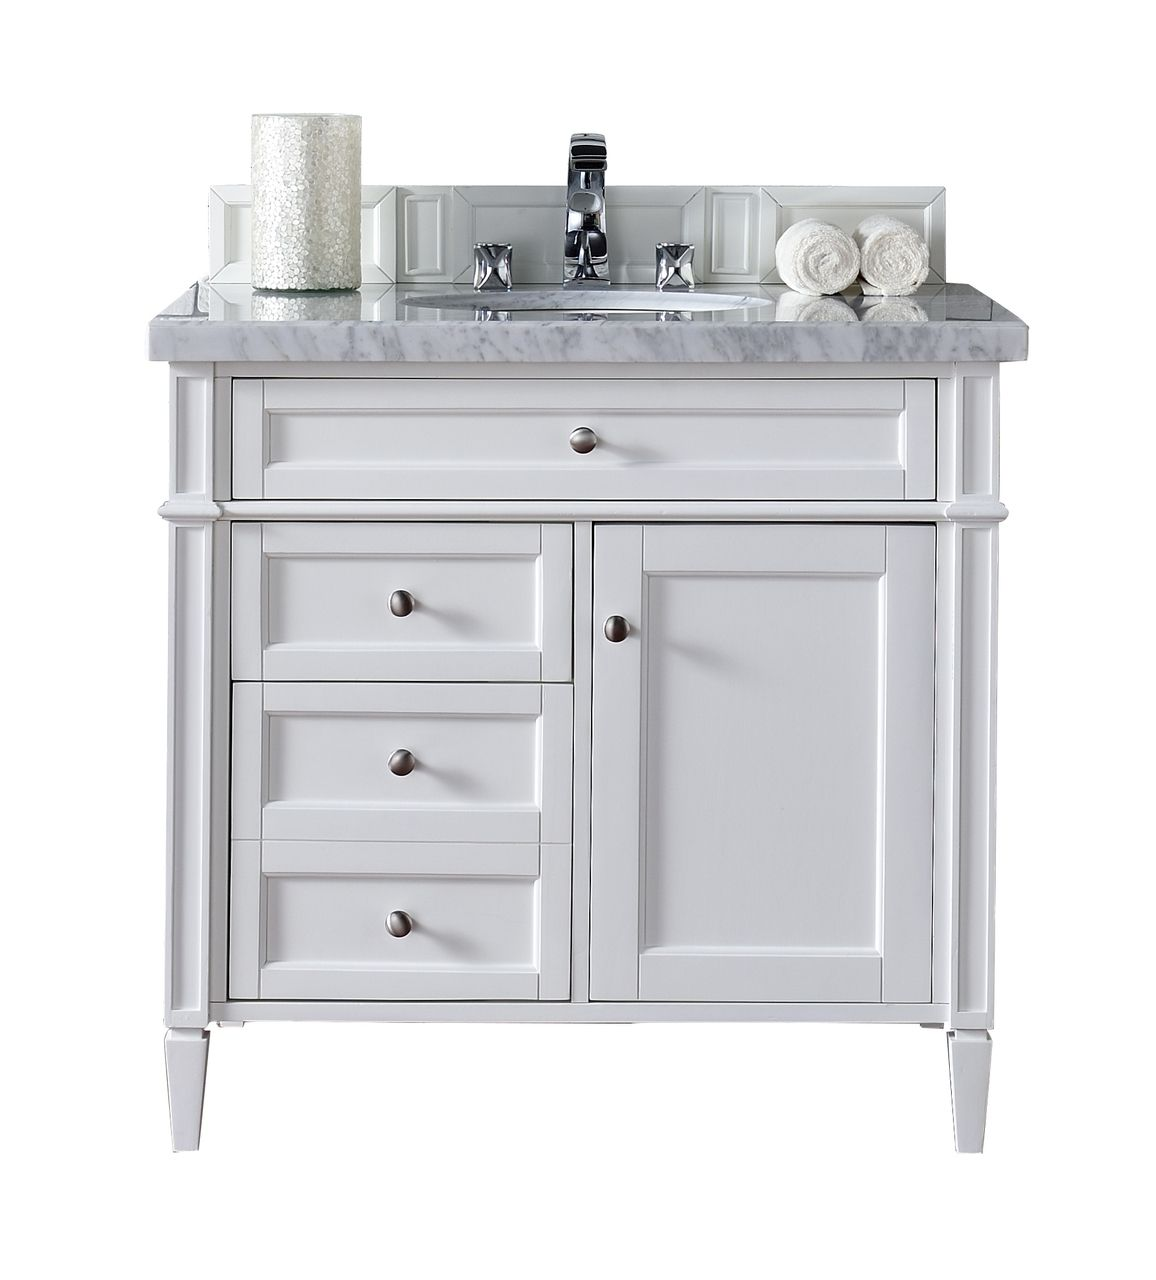 White 36 Inch Bathroom Vanity With Top 36 Inch Bathroom Vanity